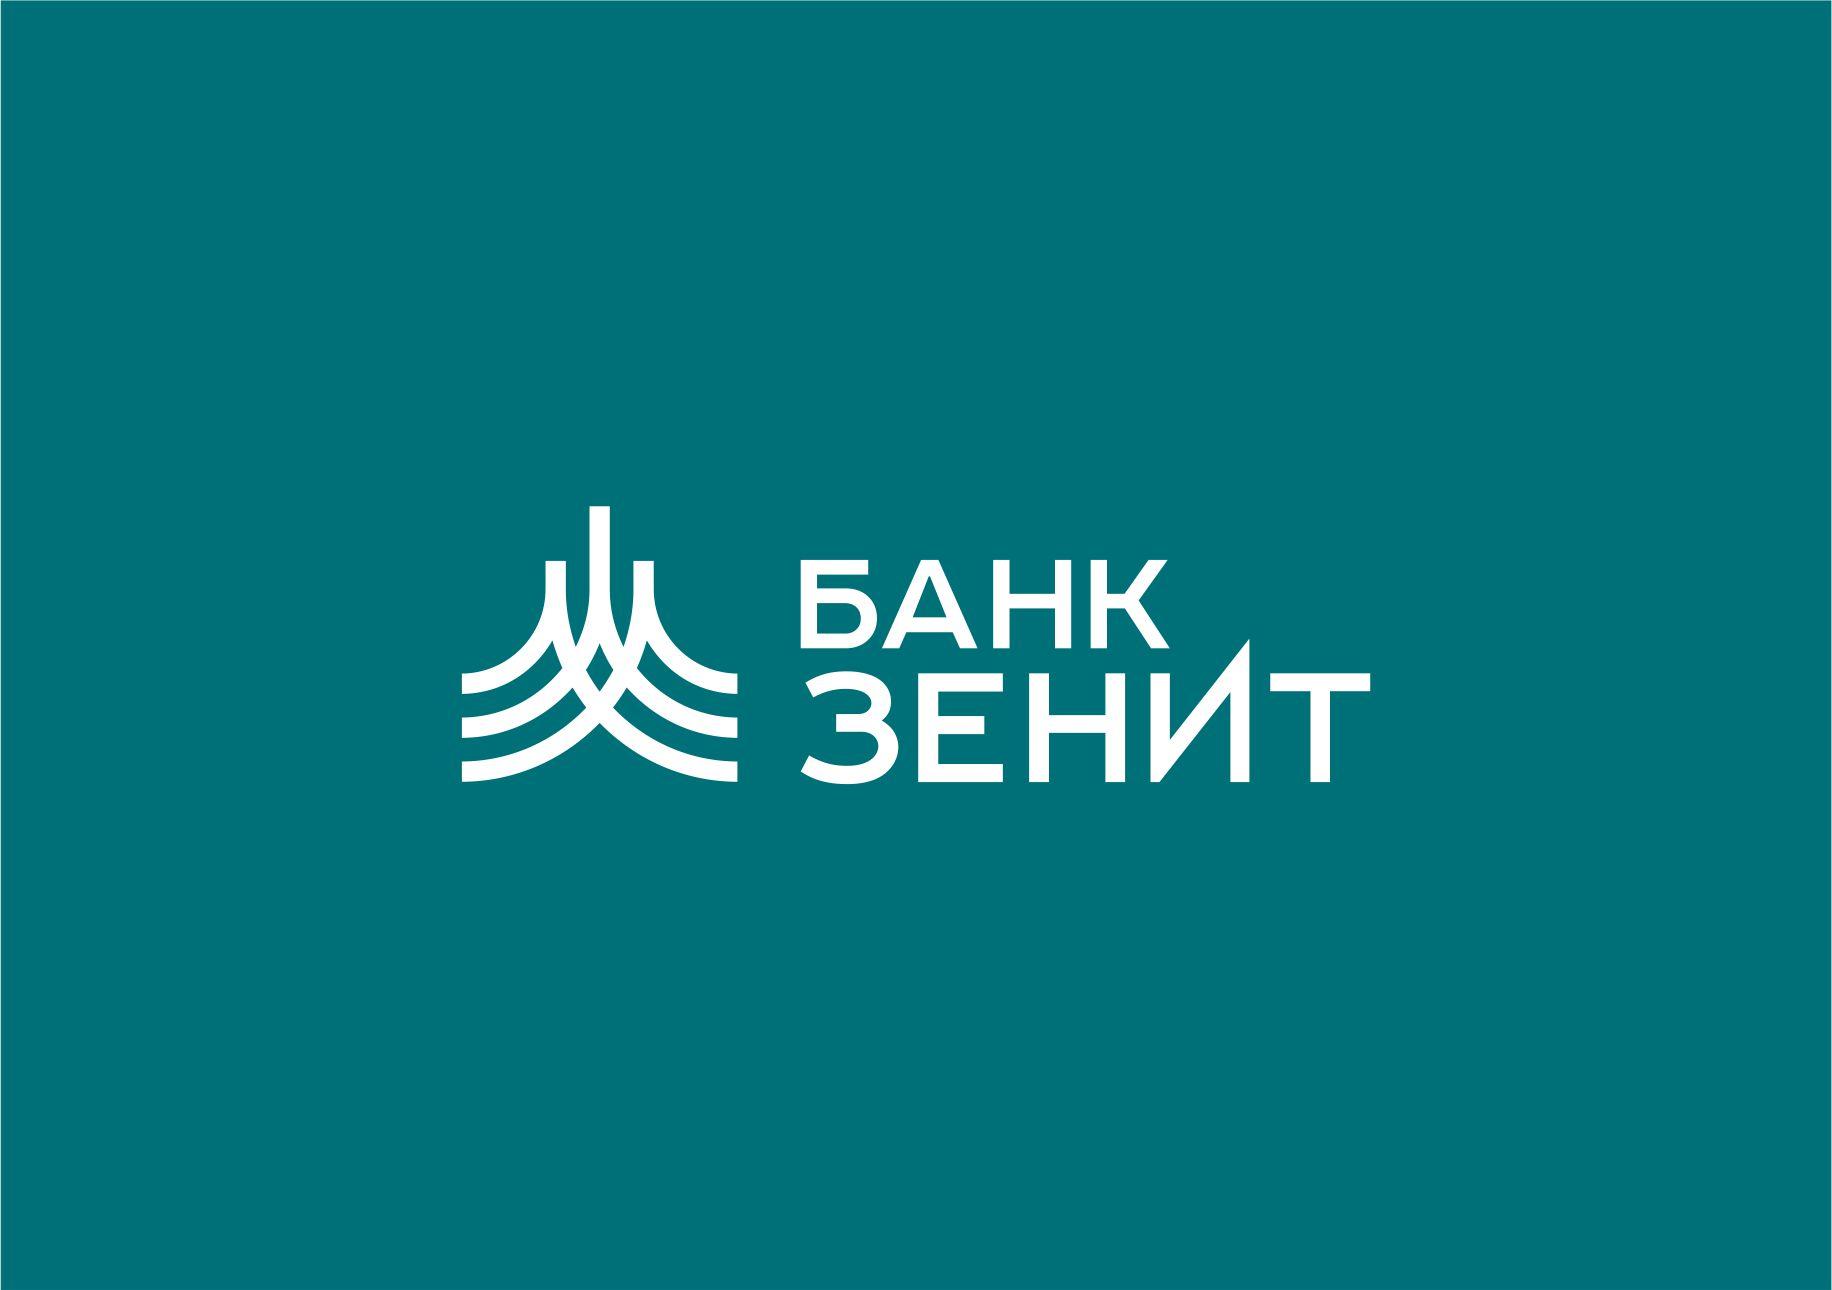 Разработка логотипа для Банка ЗЕНИТ фото f_0765b4baaefbe174.jpg